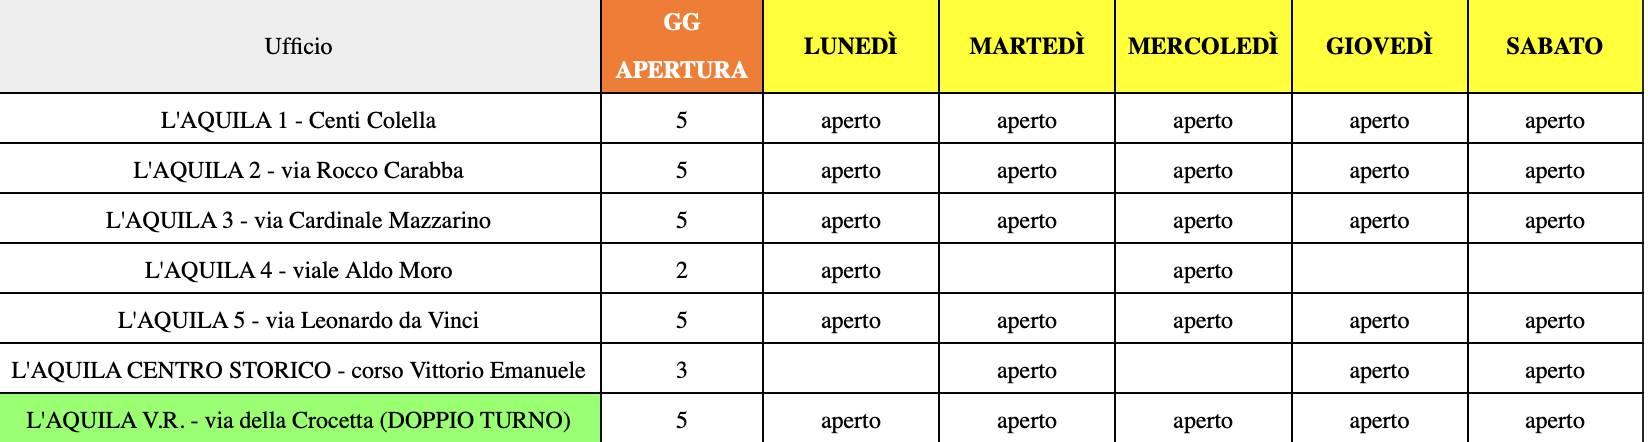 tabella orari poste